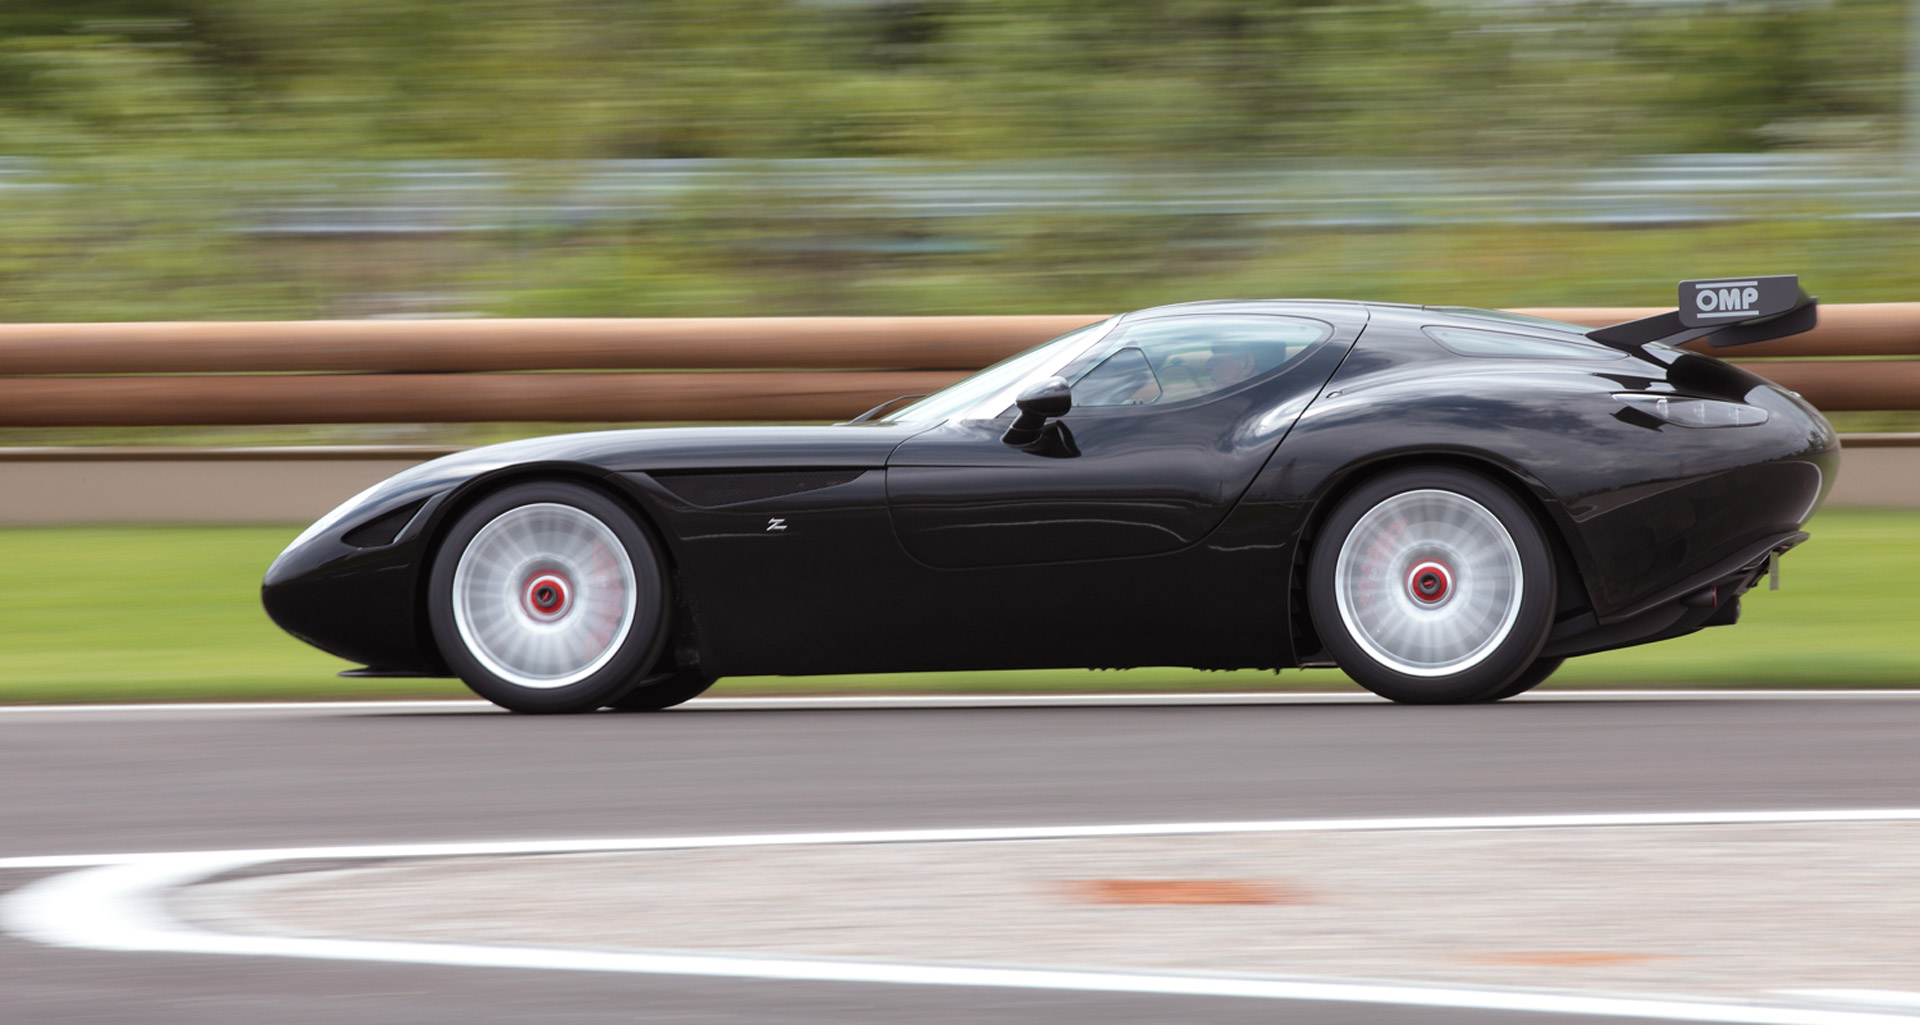 Zagato Honors Maserati With Stunning Mostro Sports Car At